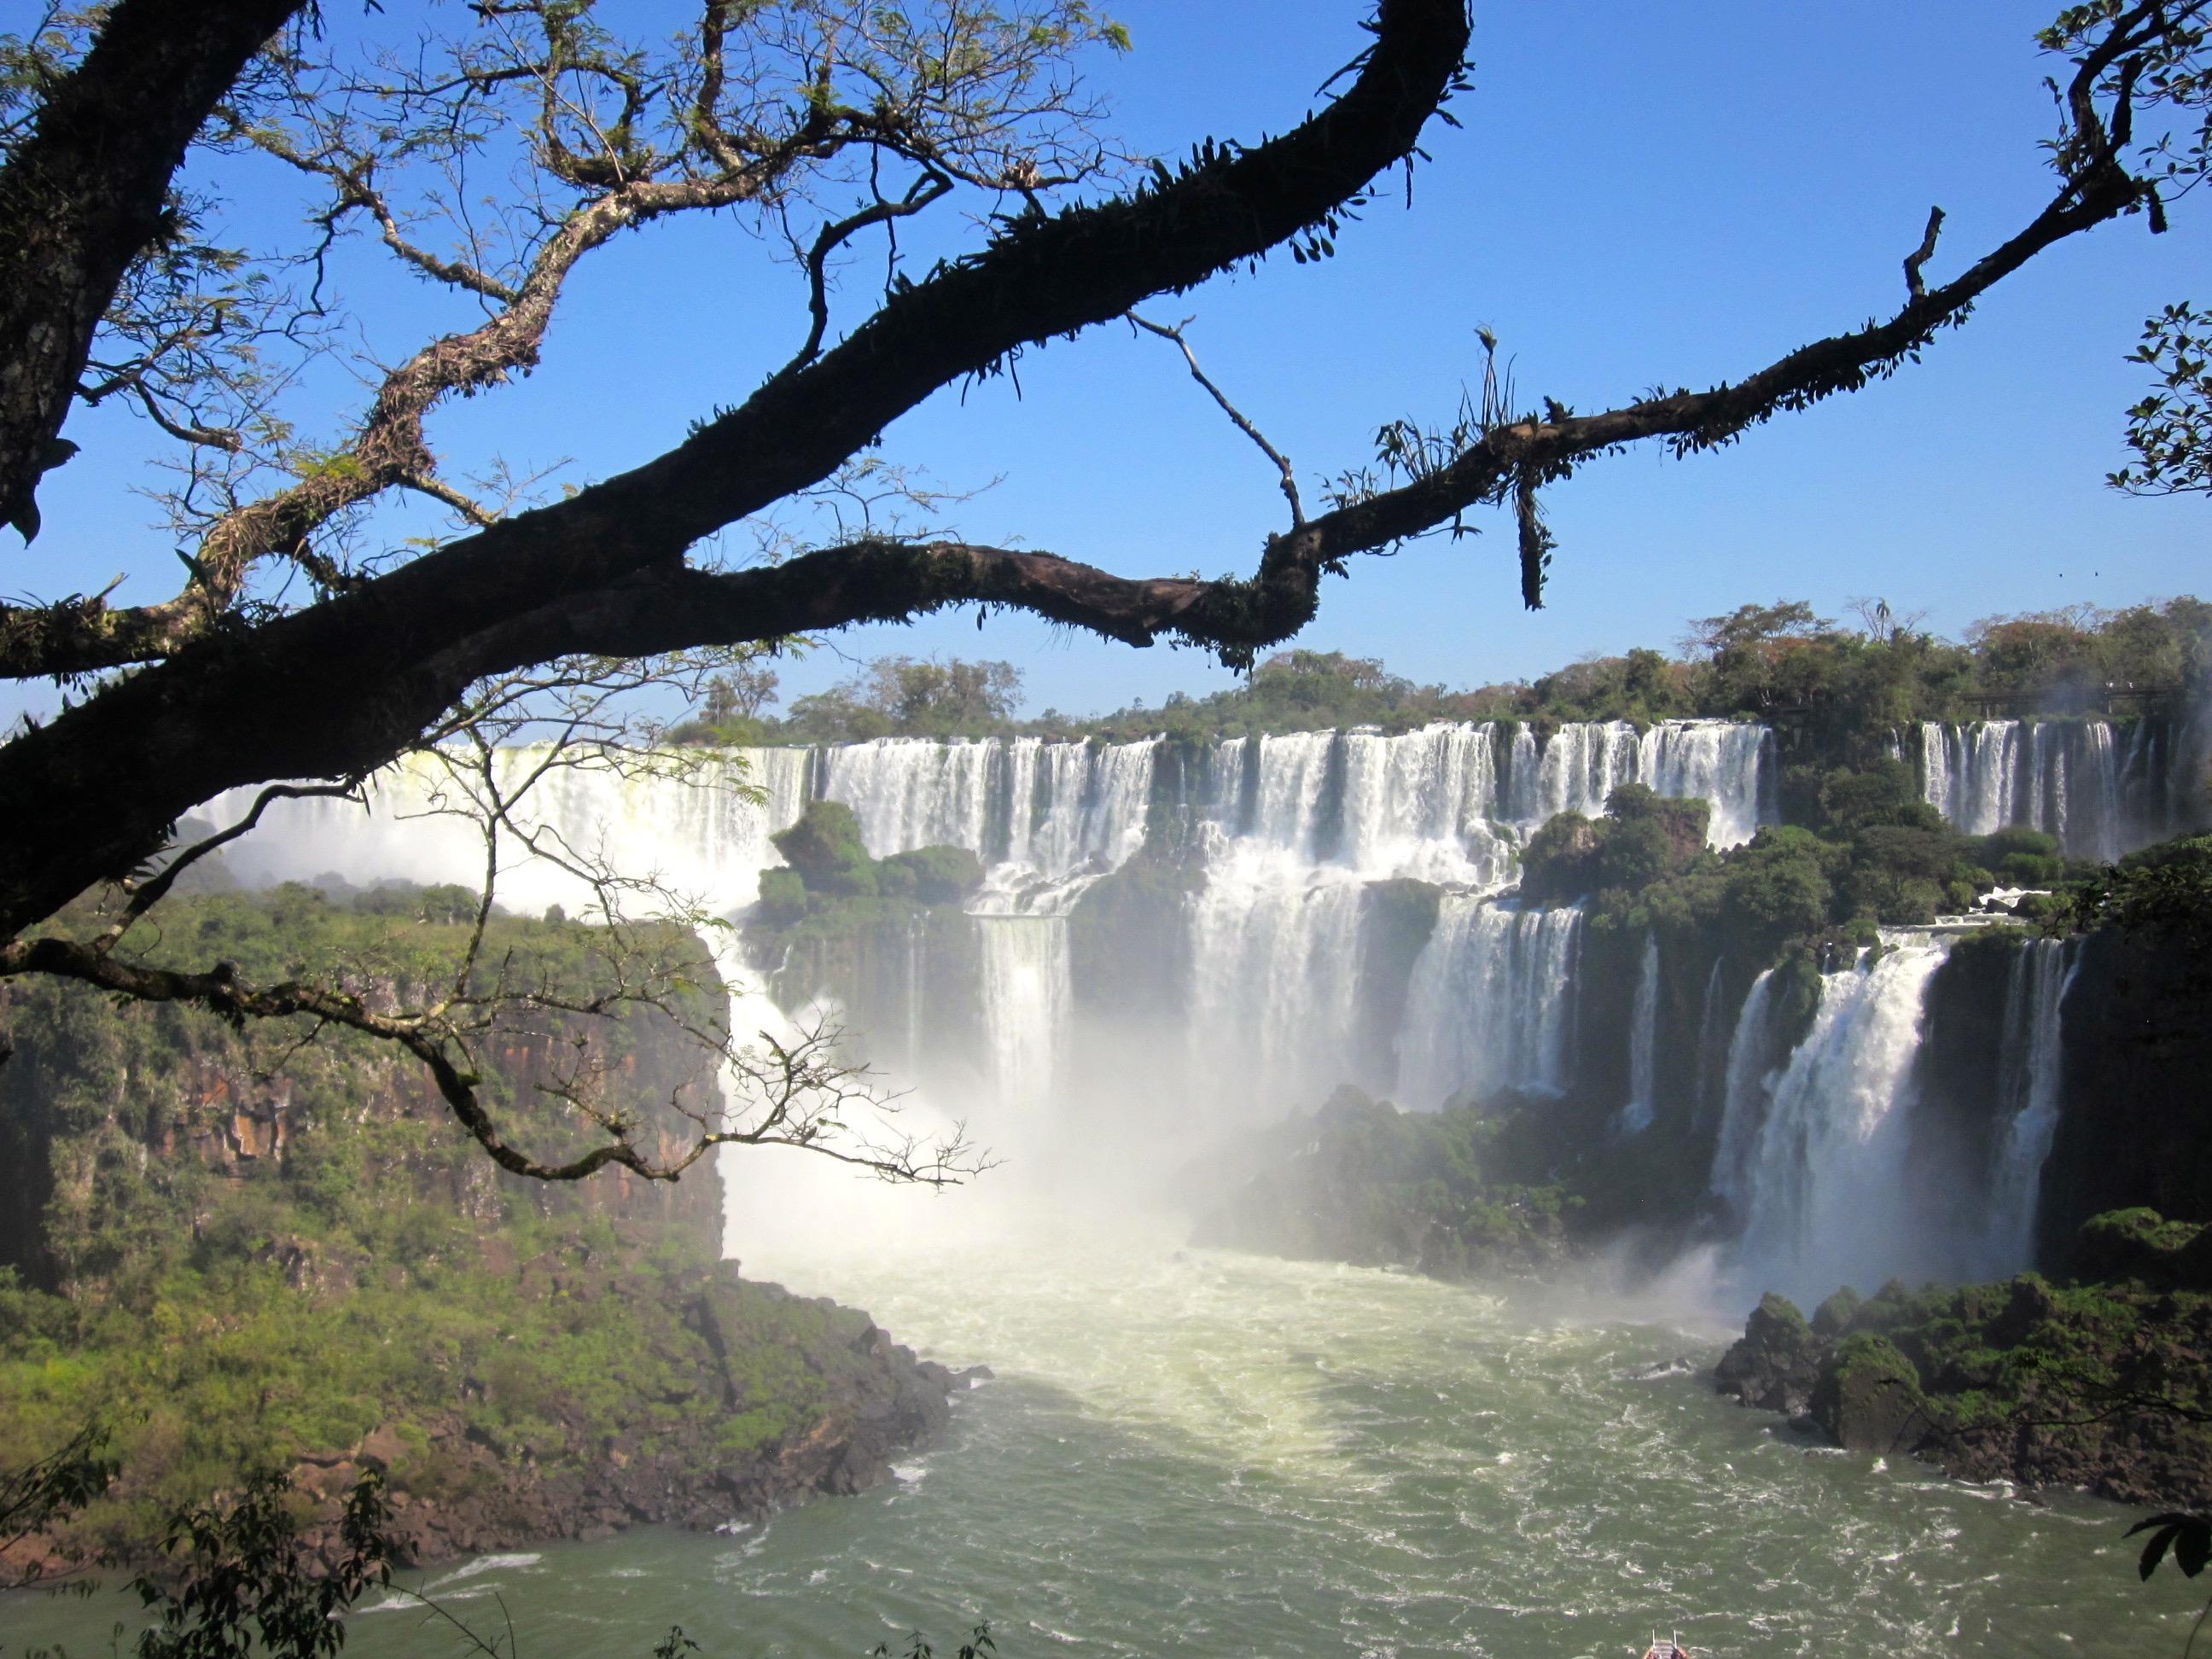 A Visit to Iguazu Falls